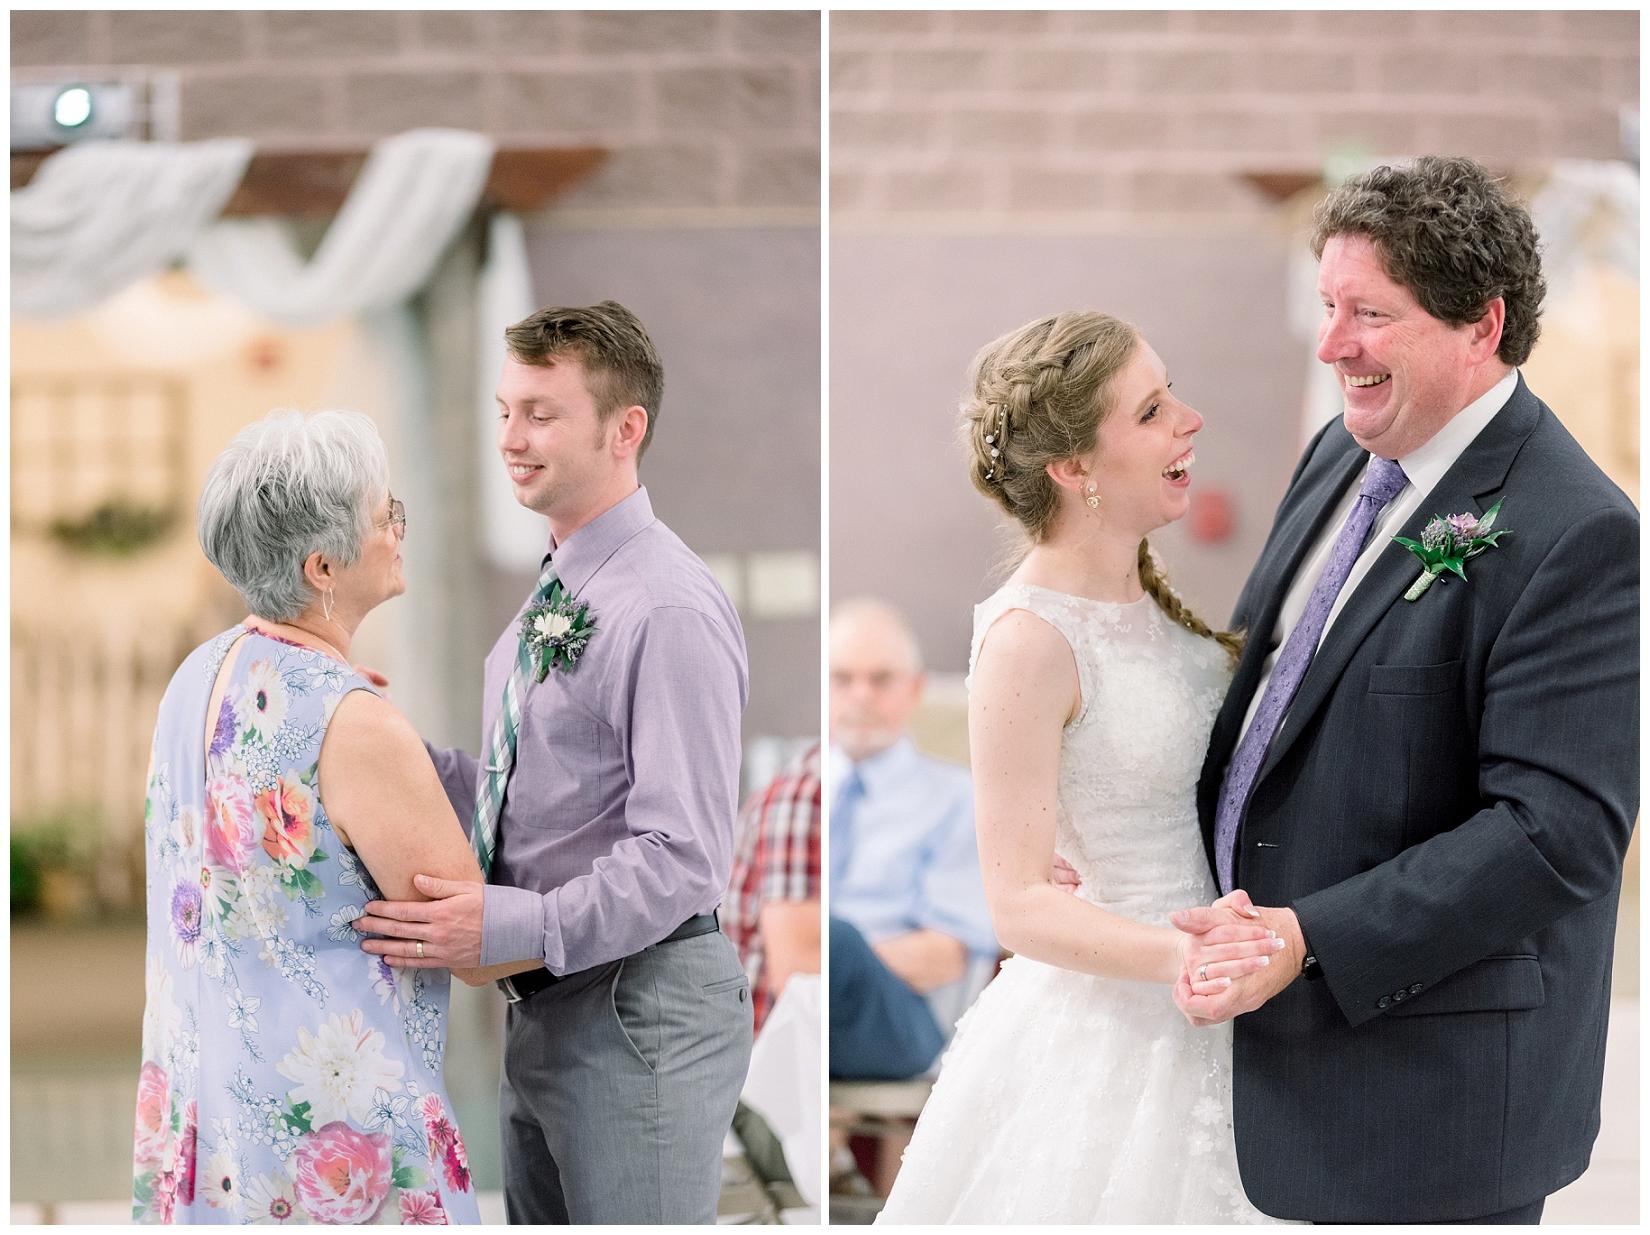 cat-alkire-wedding-photographer-indiana-chicago-indianapolis-fort-wayne_1328.jpg